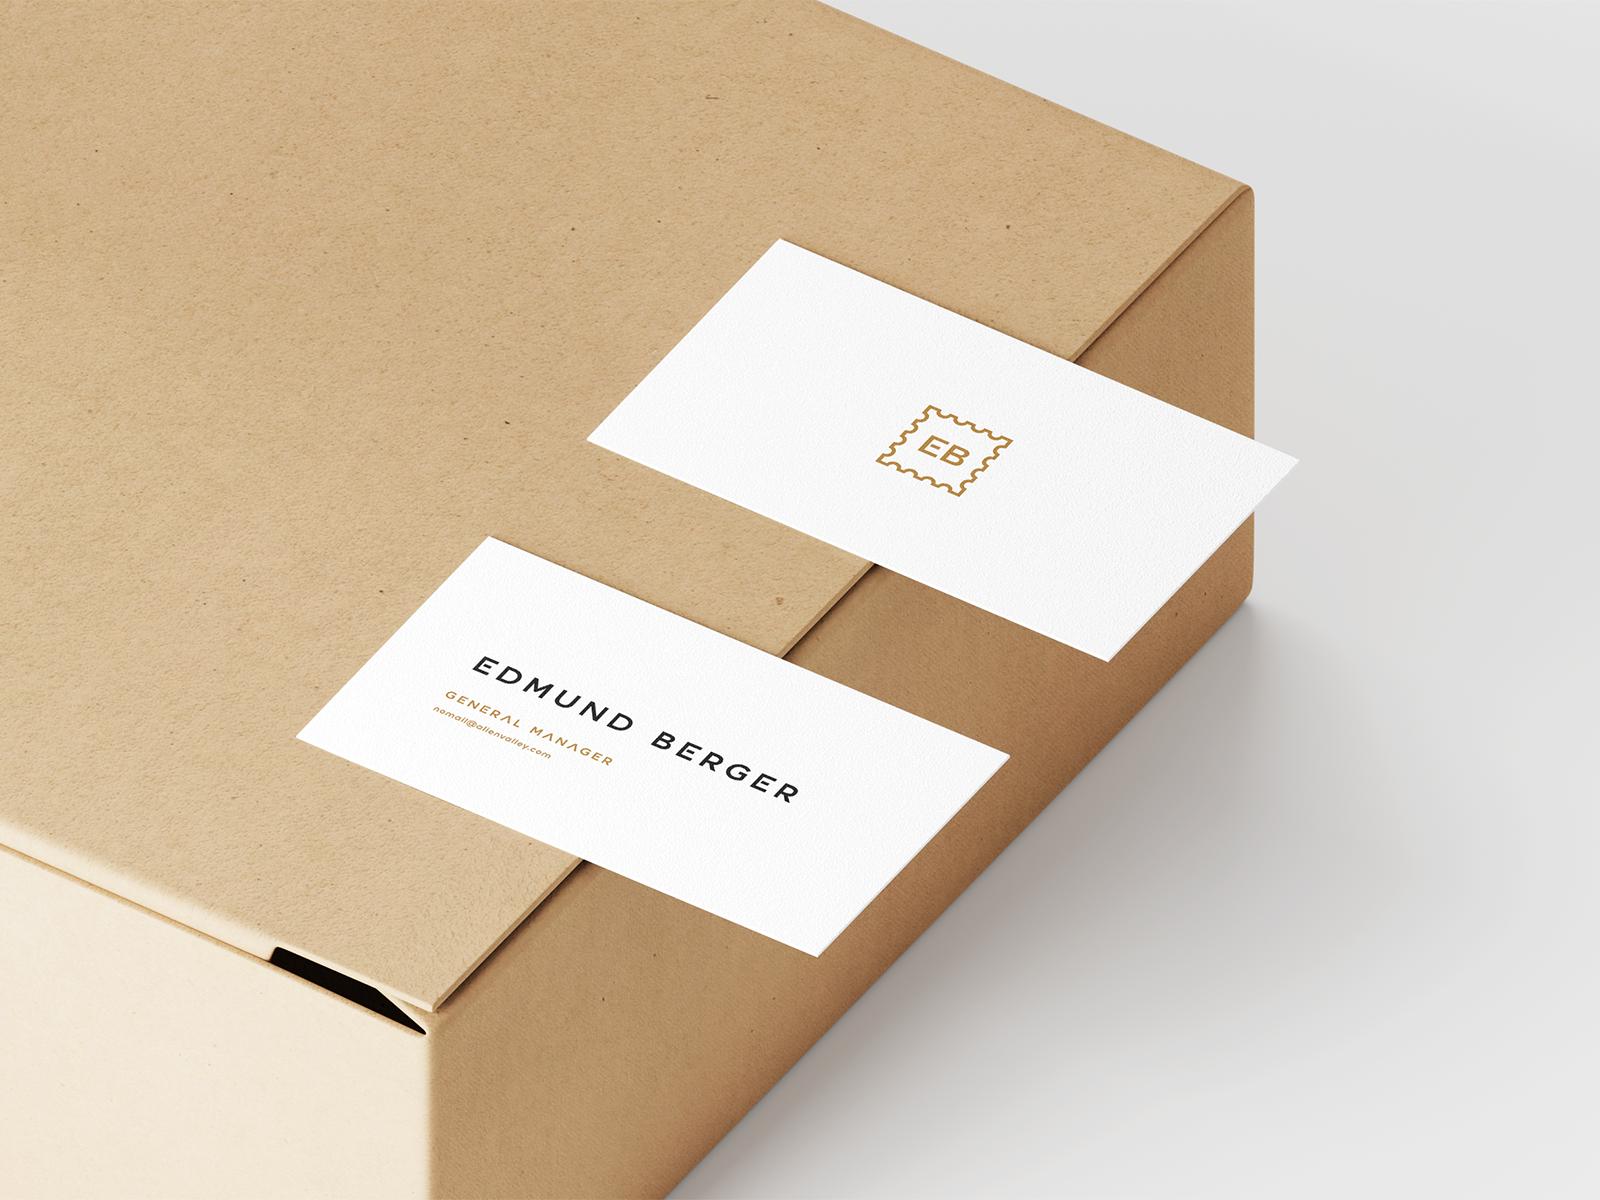 Freebie Business Cards On Box Mockup Box Mockup Download Business Card Free Business Cards